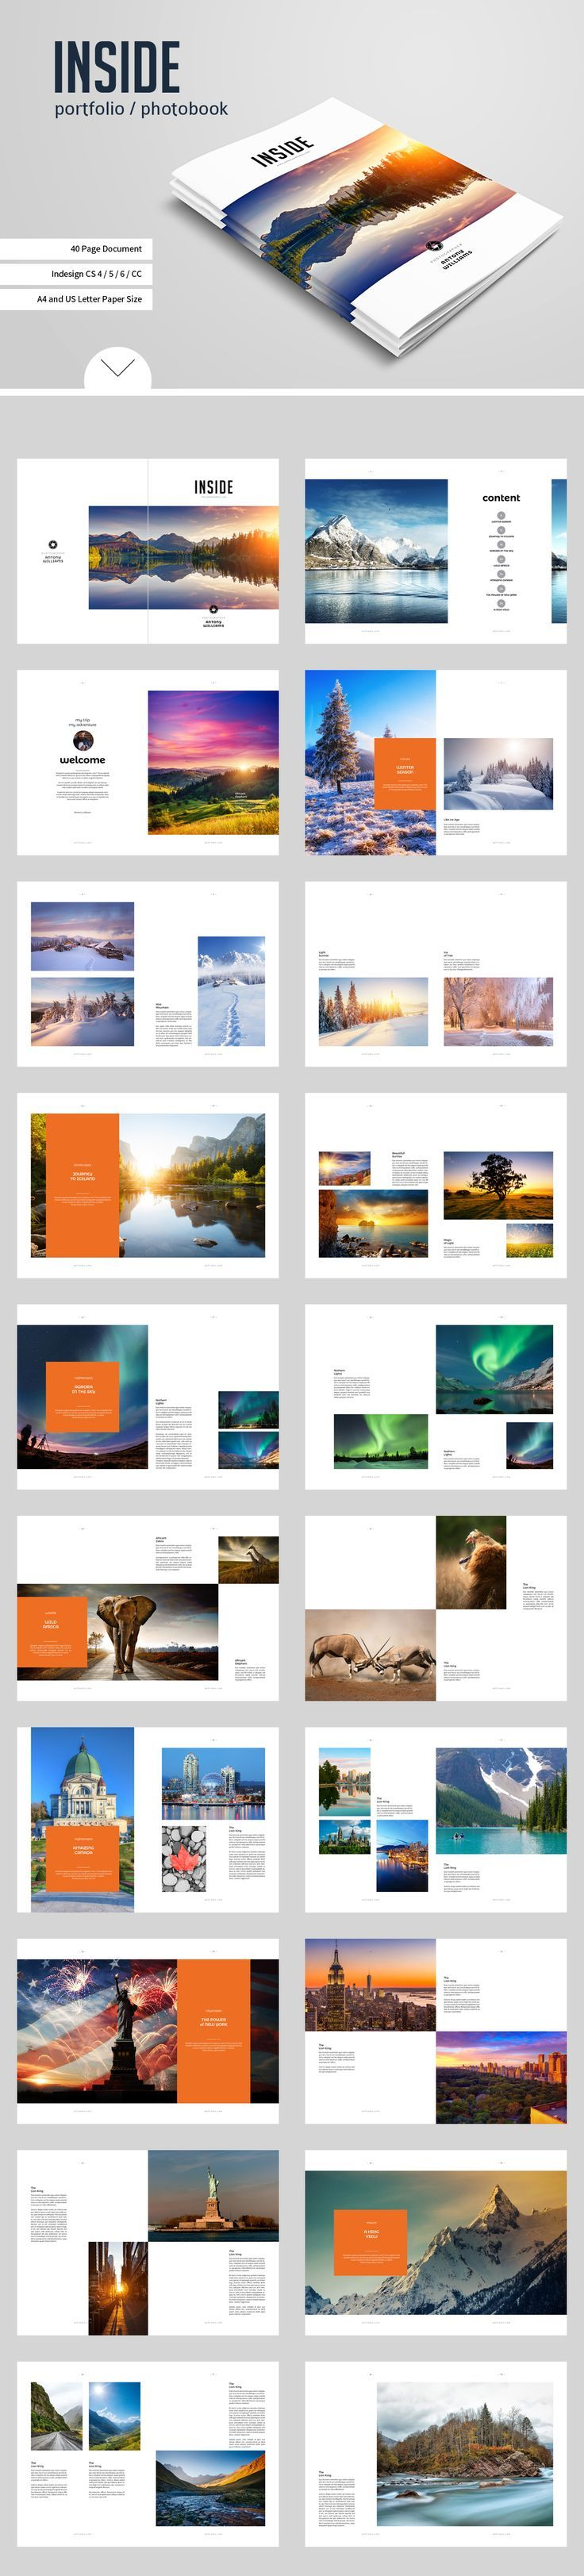 25 best Photography | Photobook Layout images on Pinterest ...